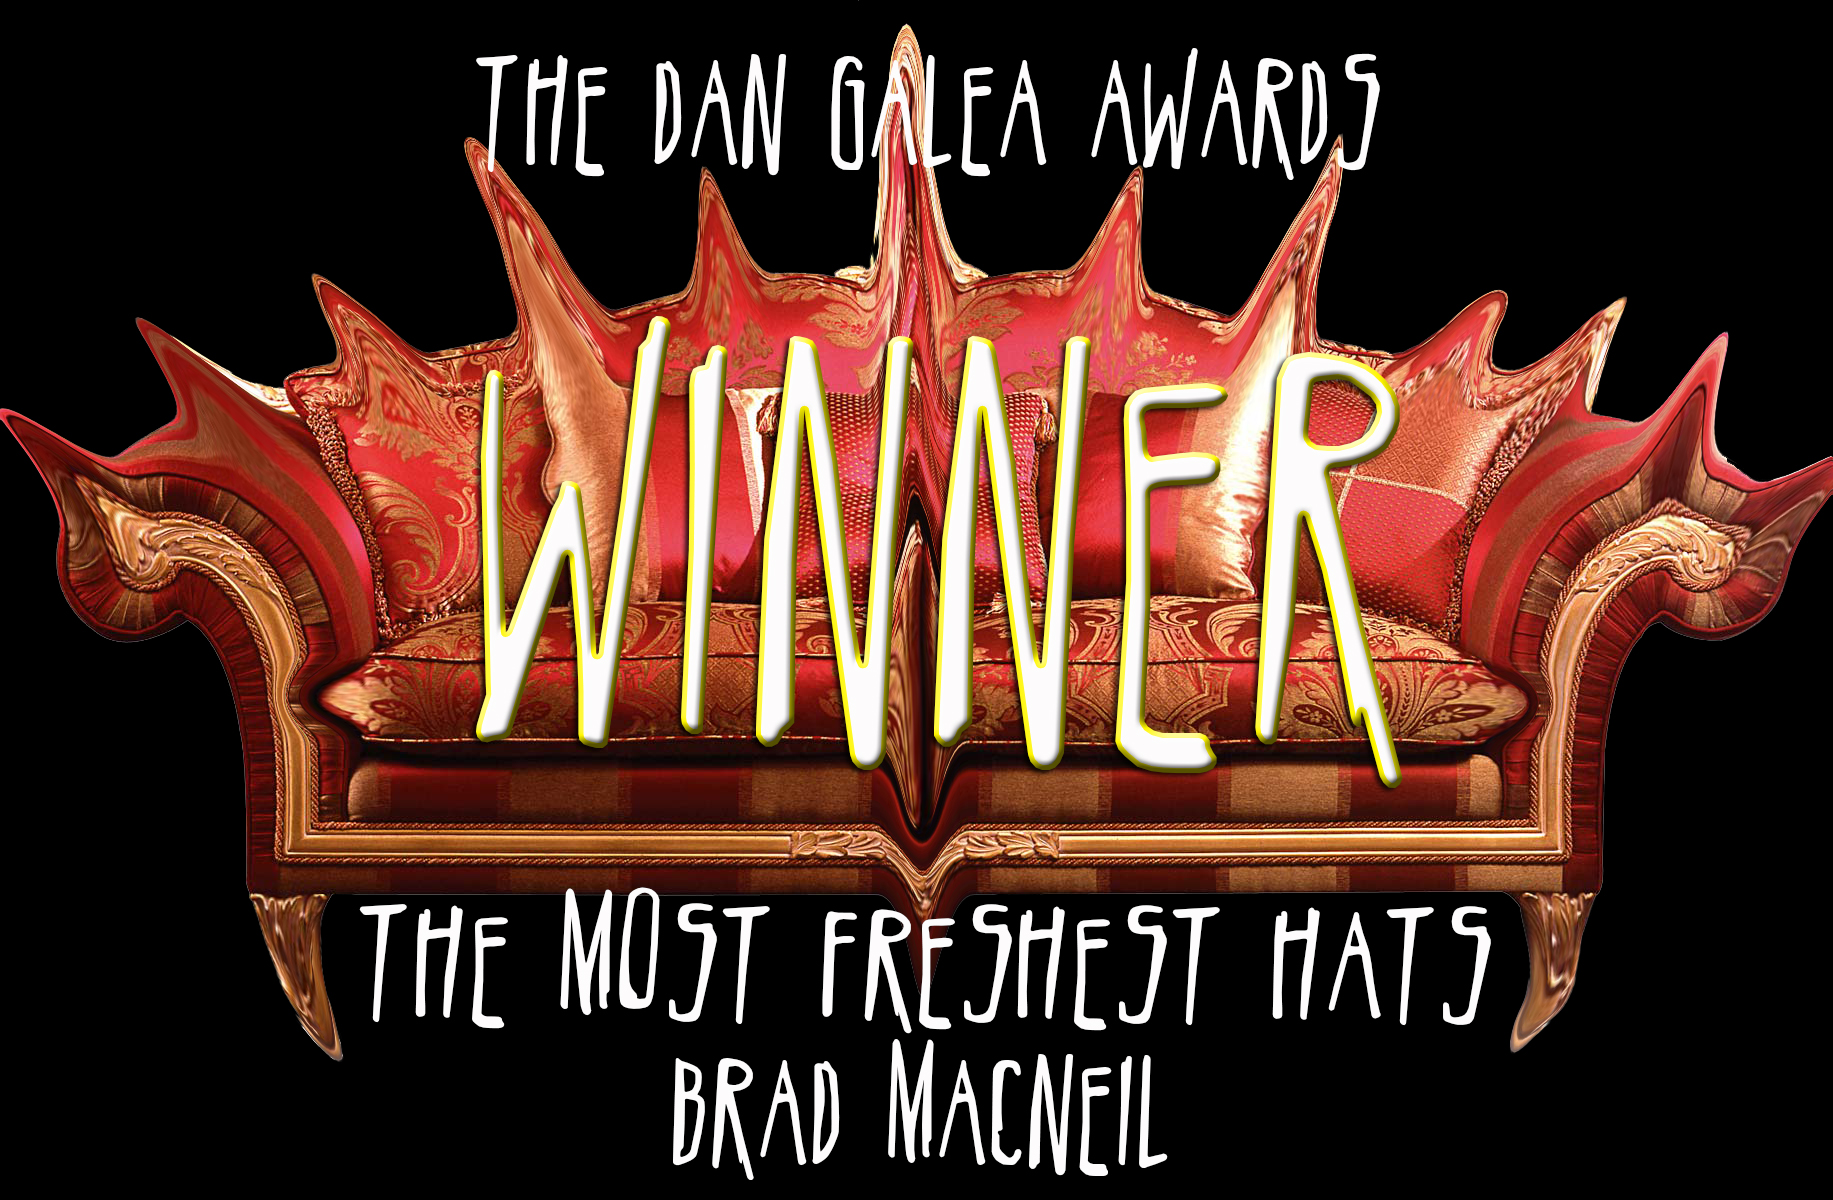 DGawards Brad macneil.jpg